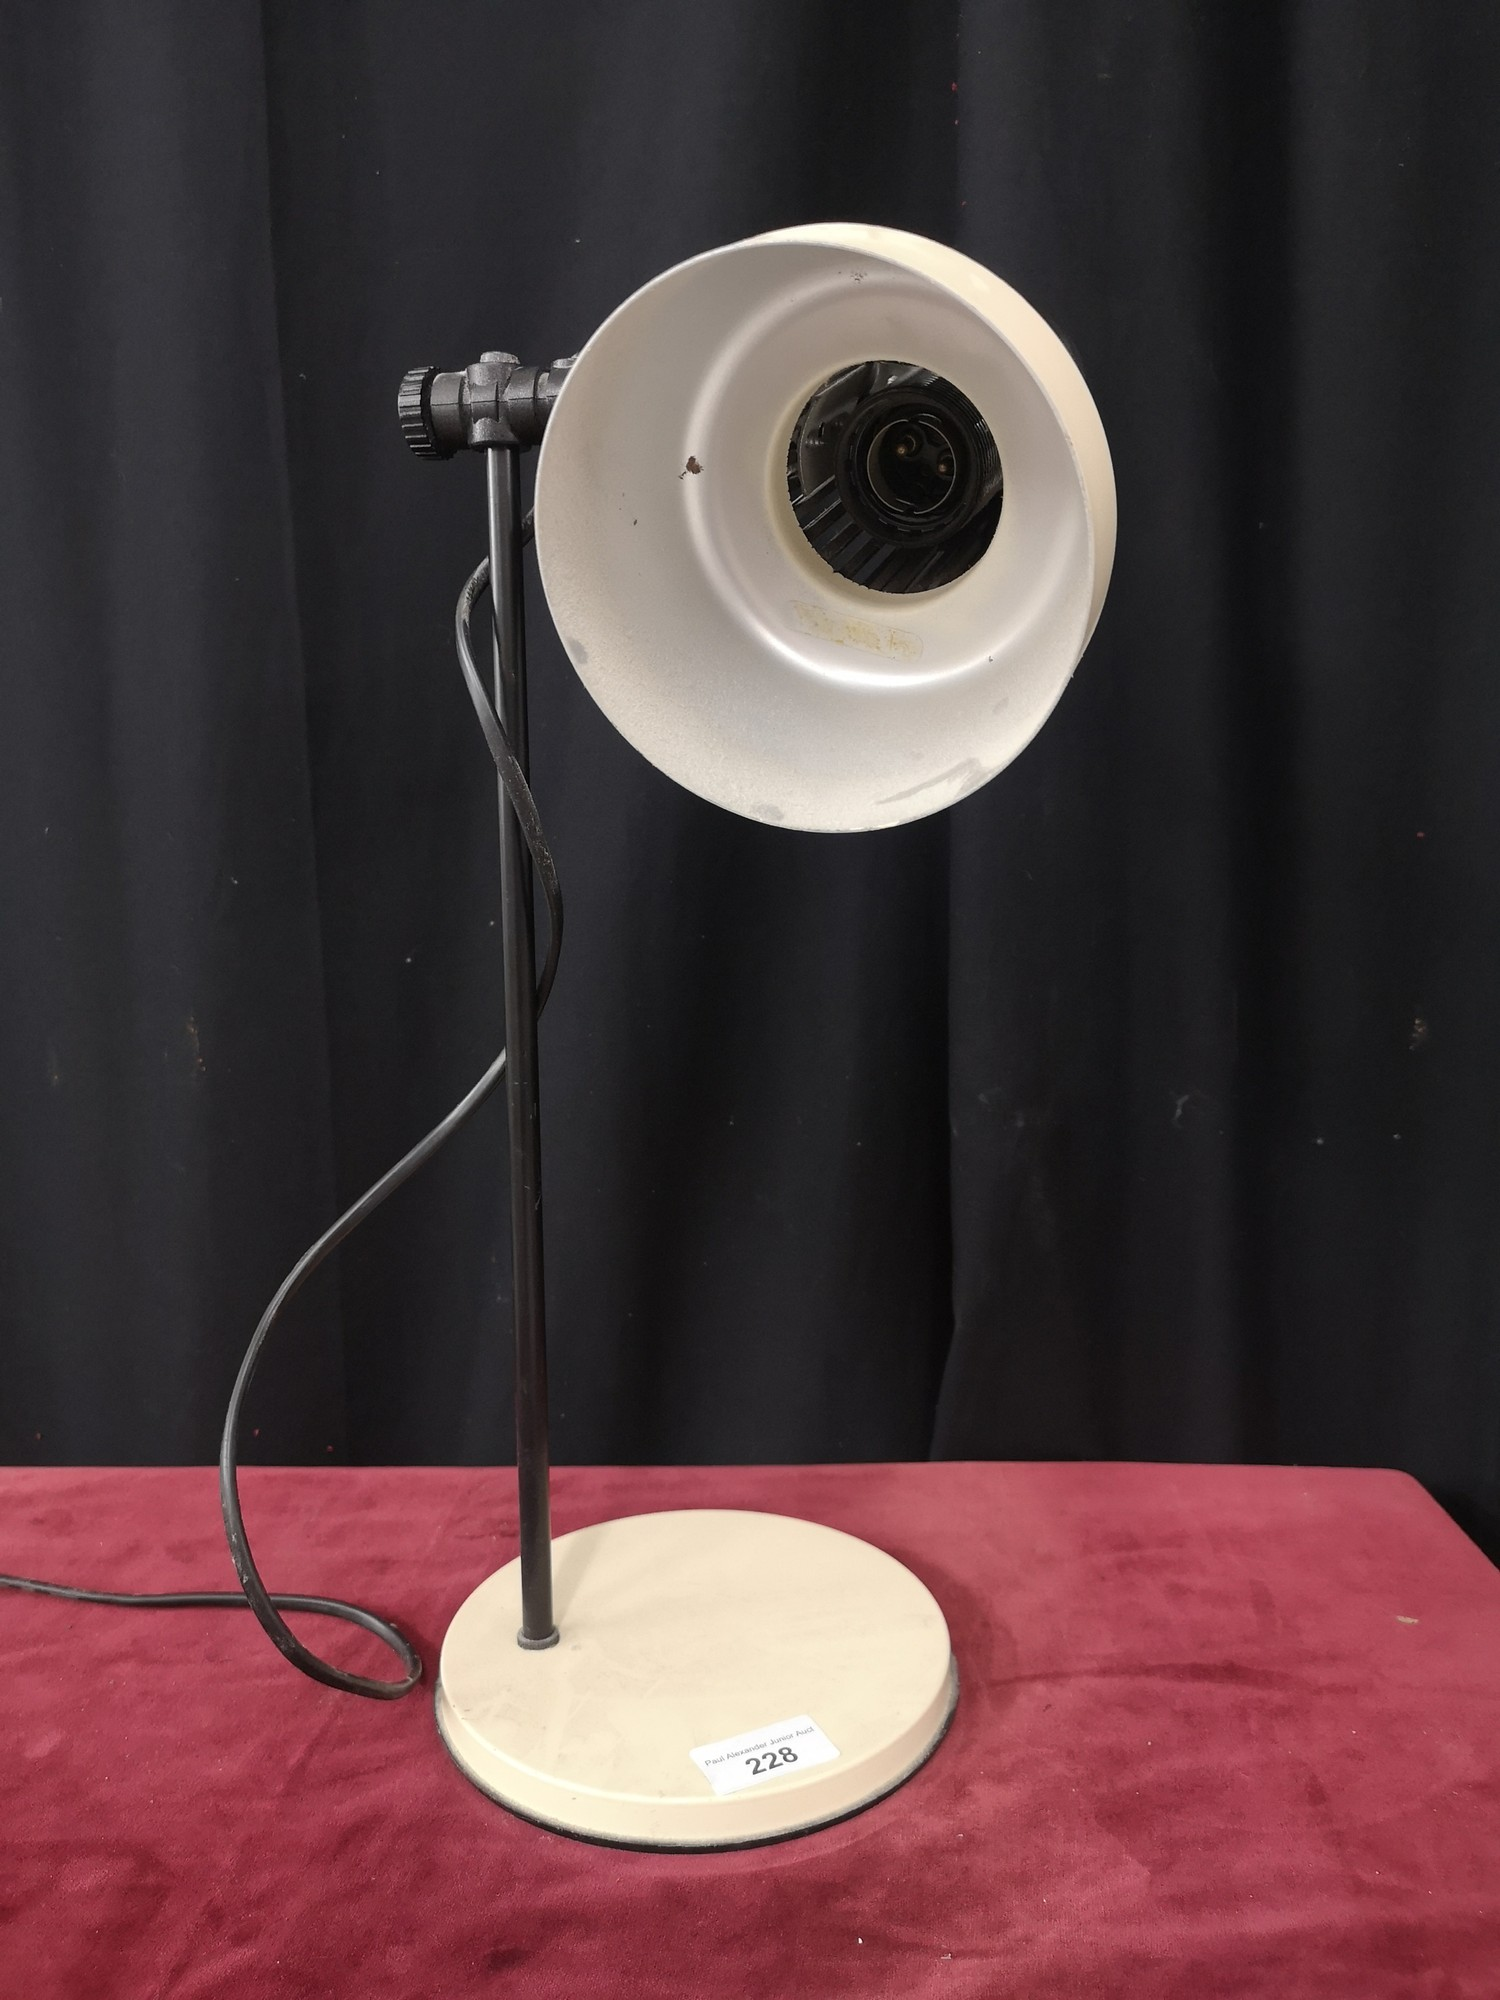 Retro 1970s angle poiste table lamp. - Image 2 of 2